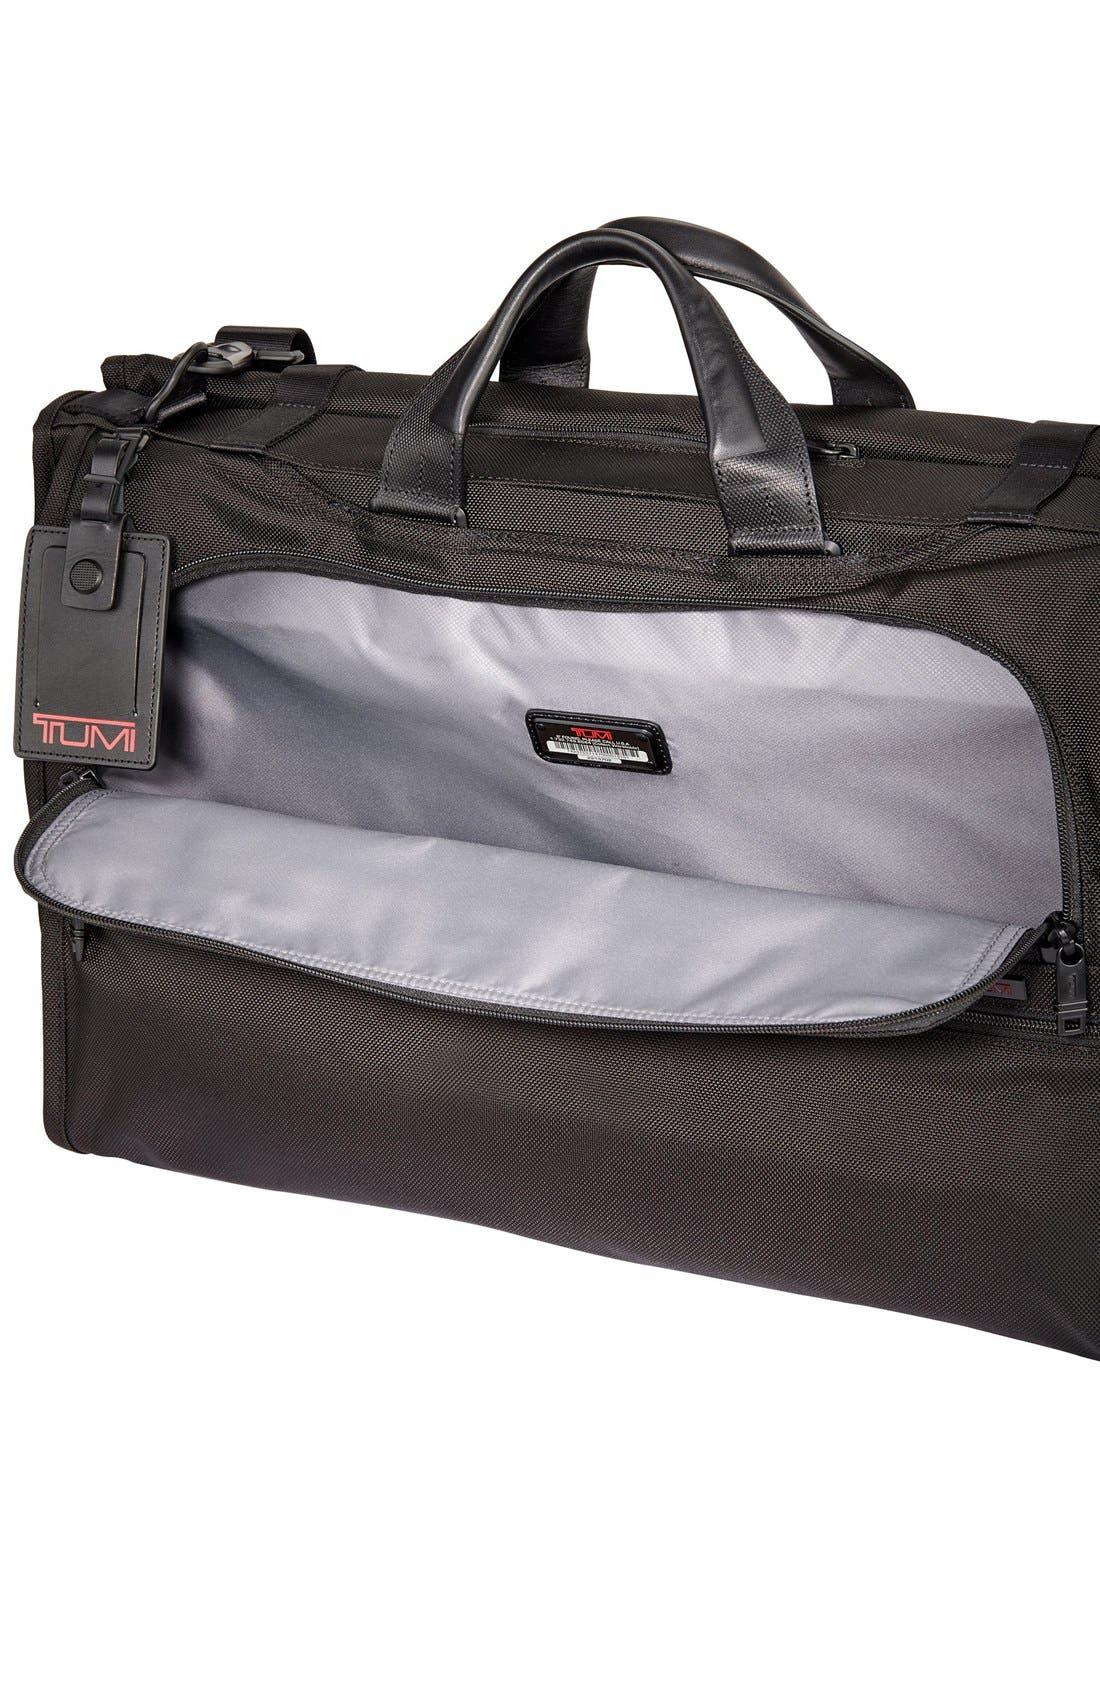 Alpha 2 22-Inch Trifold Carry-On Garment Bag,                             Alternate thumbnail 4, color,                             BLACK